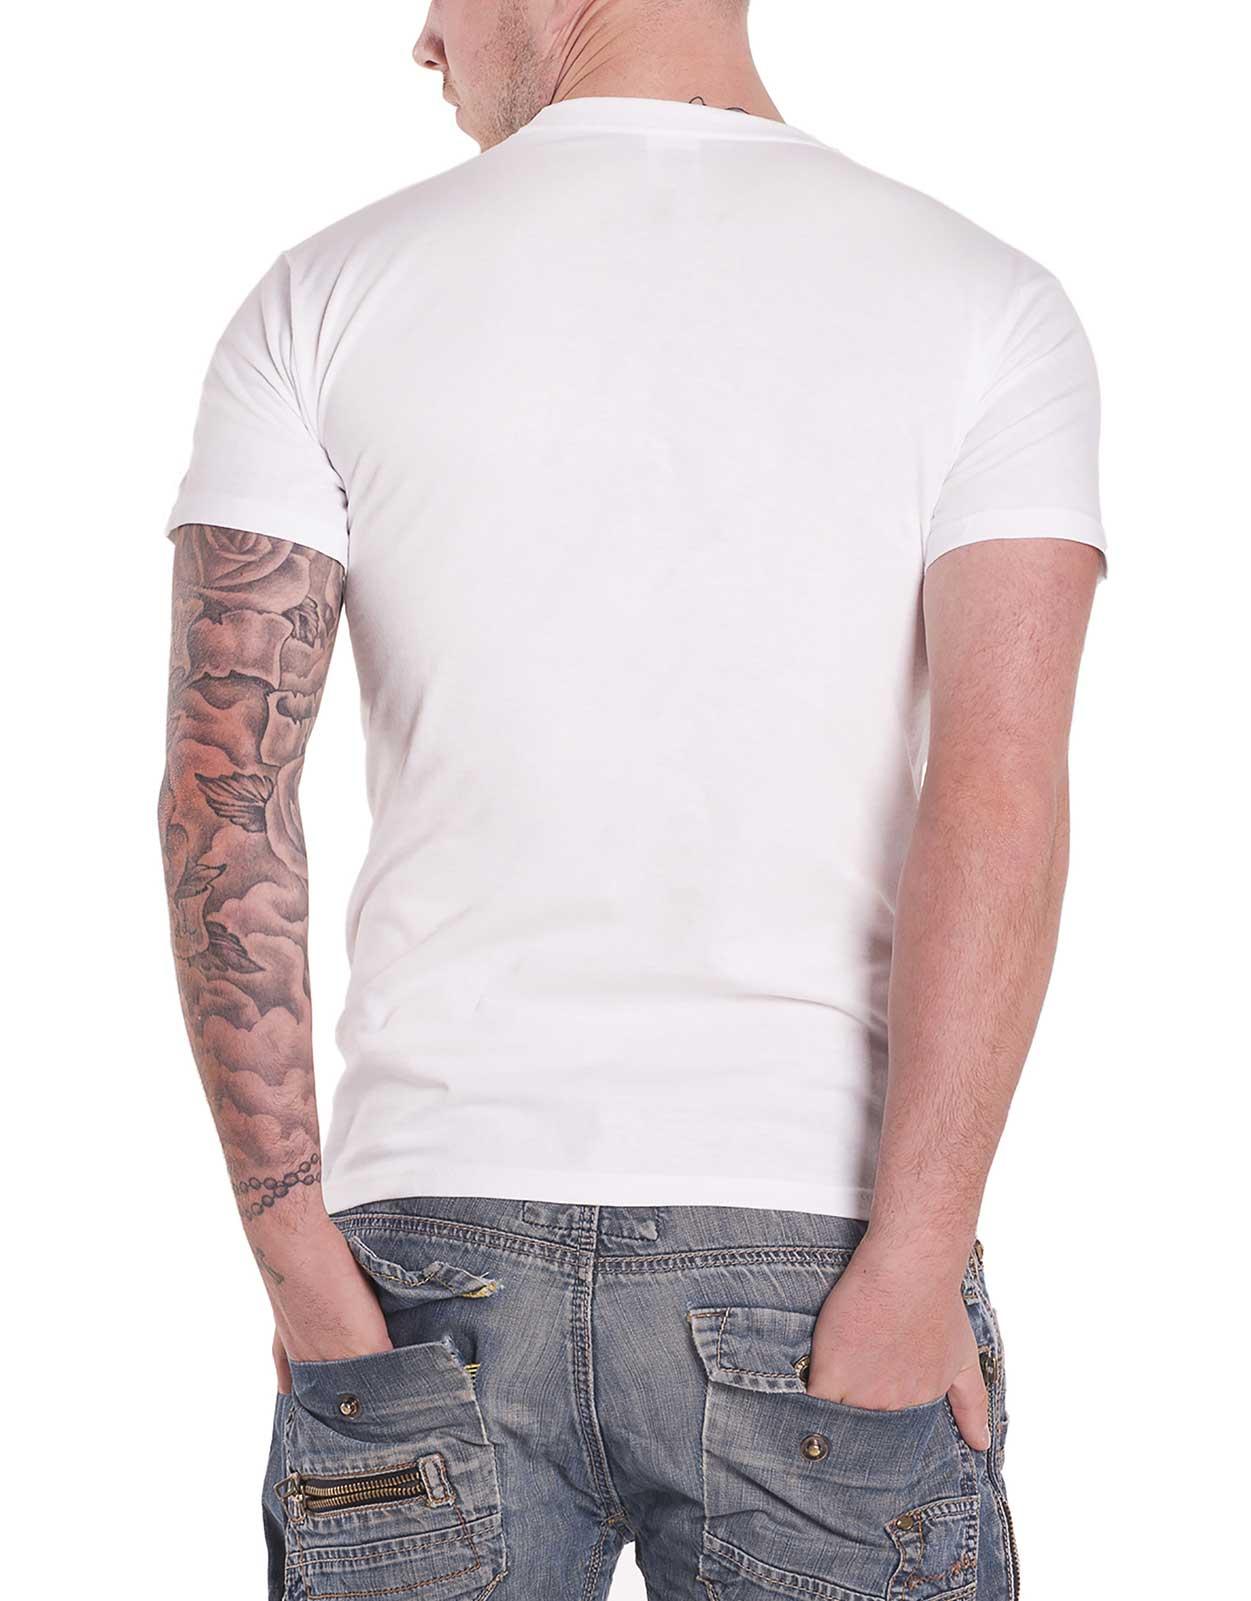 Official-Motley-Crue-T-Shirt-Shout-at-the-Devil-The-Dirt-Tour-Band-Logo-Mens thumbnail 45